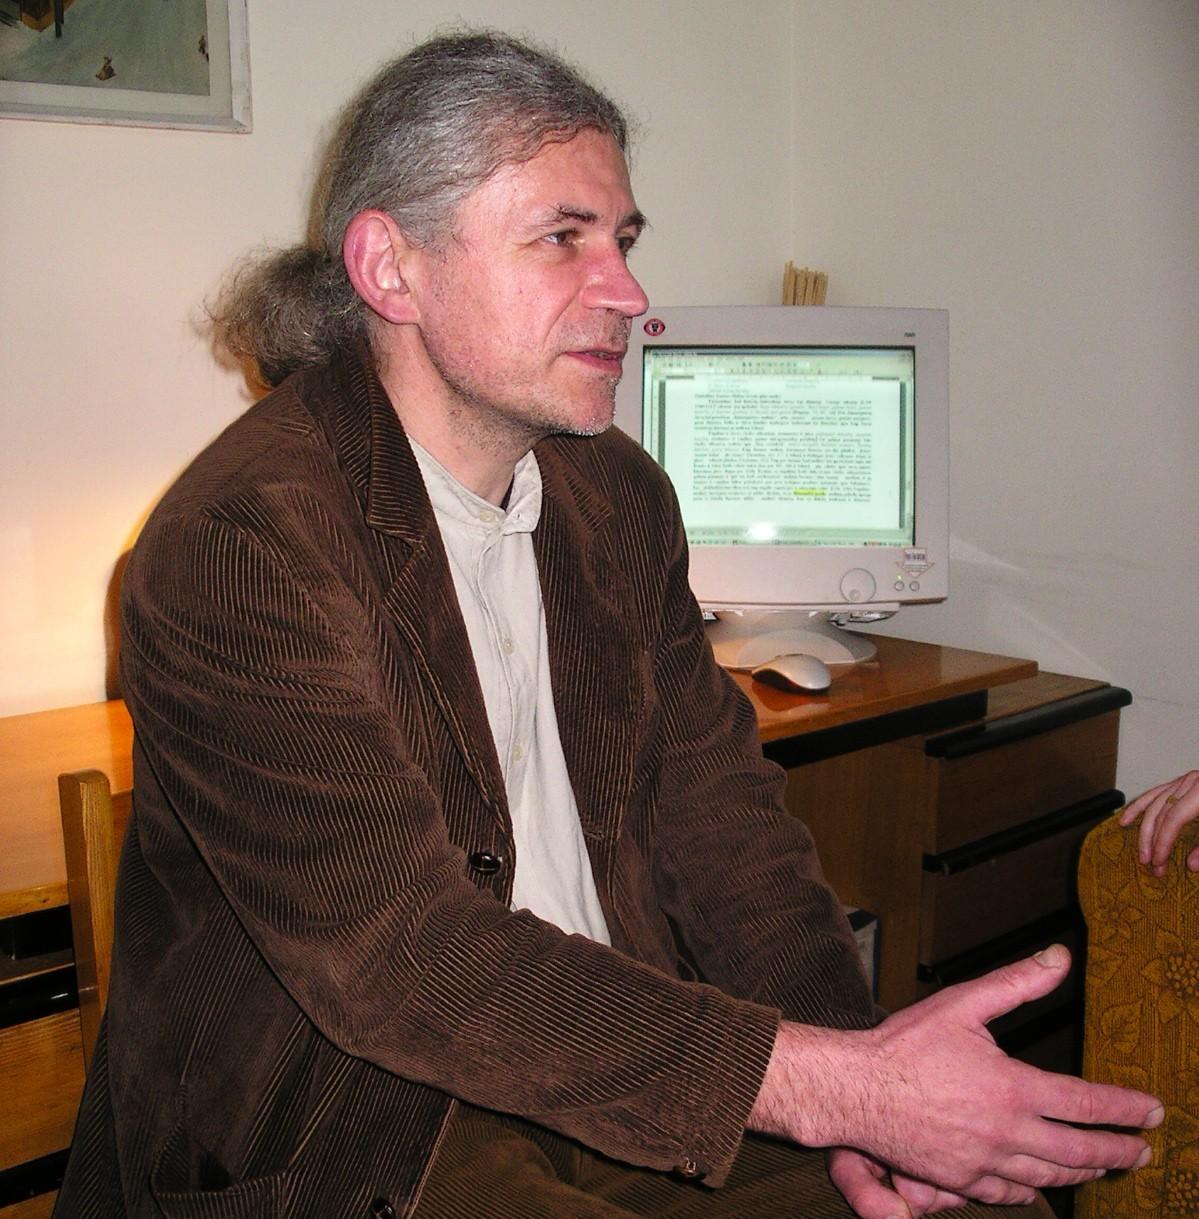 dr. Dainius Razauskas | J.Vaiškūno nuotr., Alkas.lt